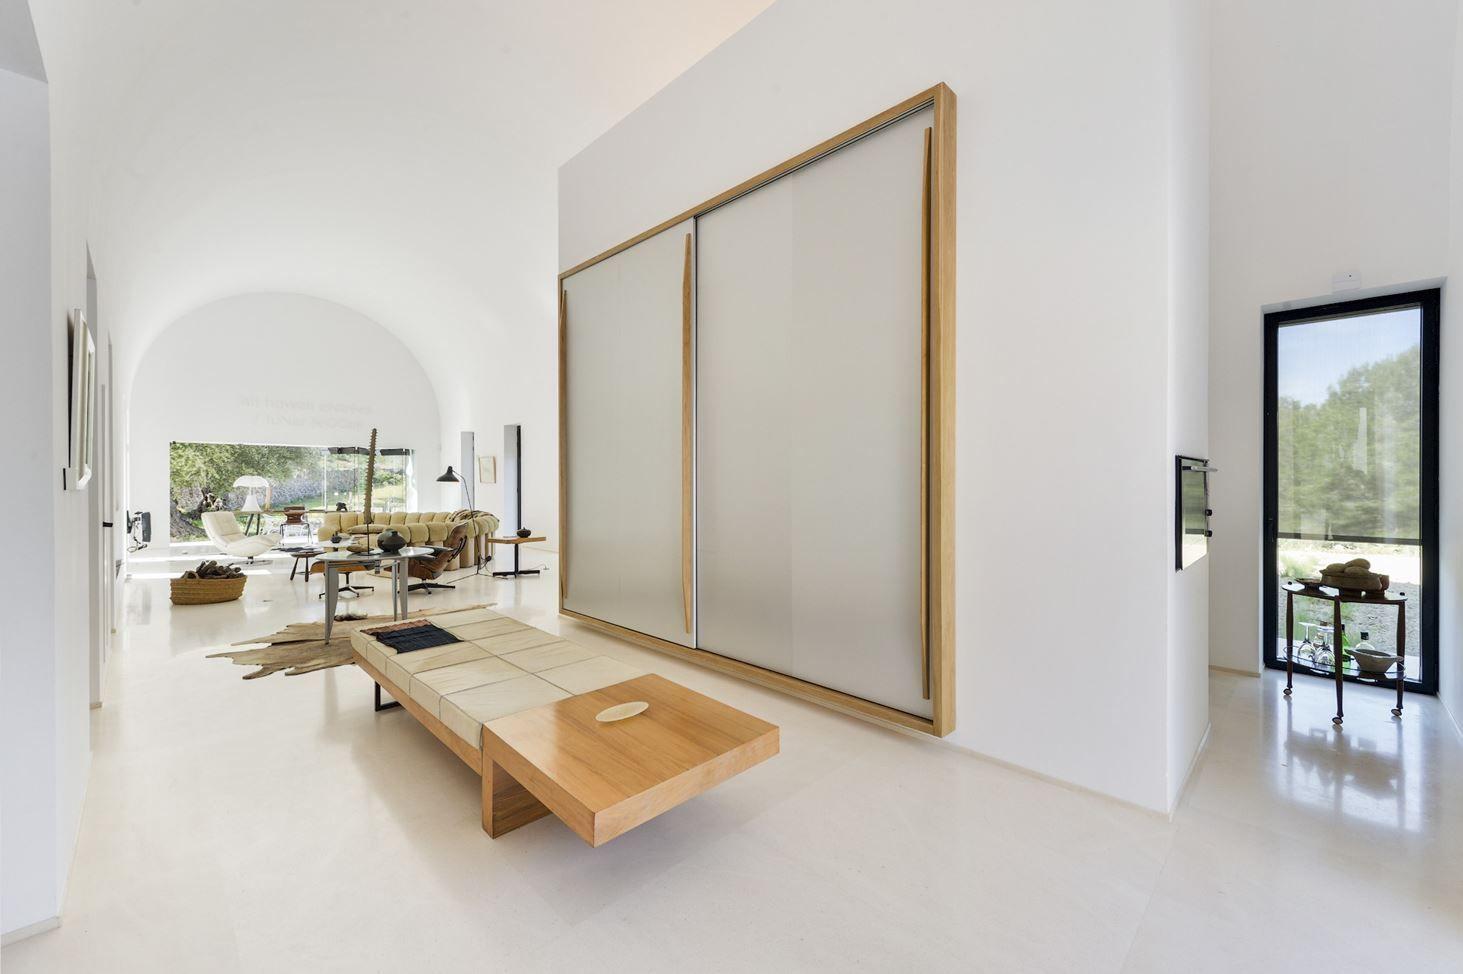 Pascal Cheikh Djavadi Designs A Spacious And Peaceful Villa In Ibiza